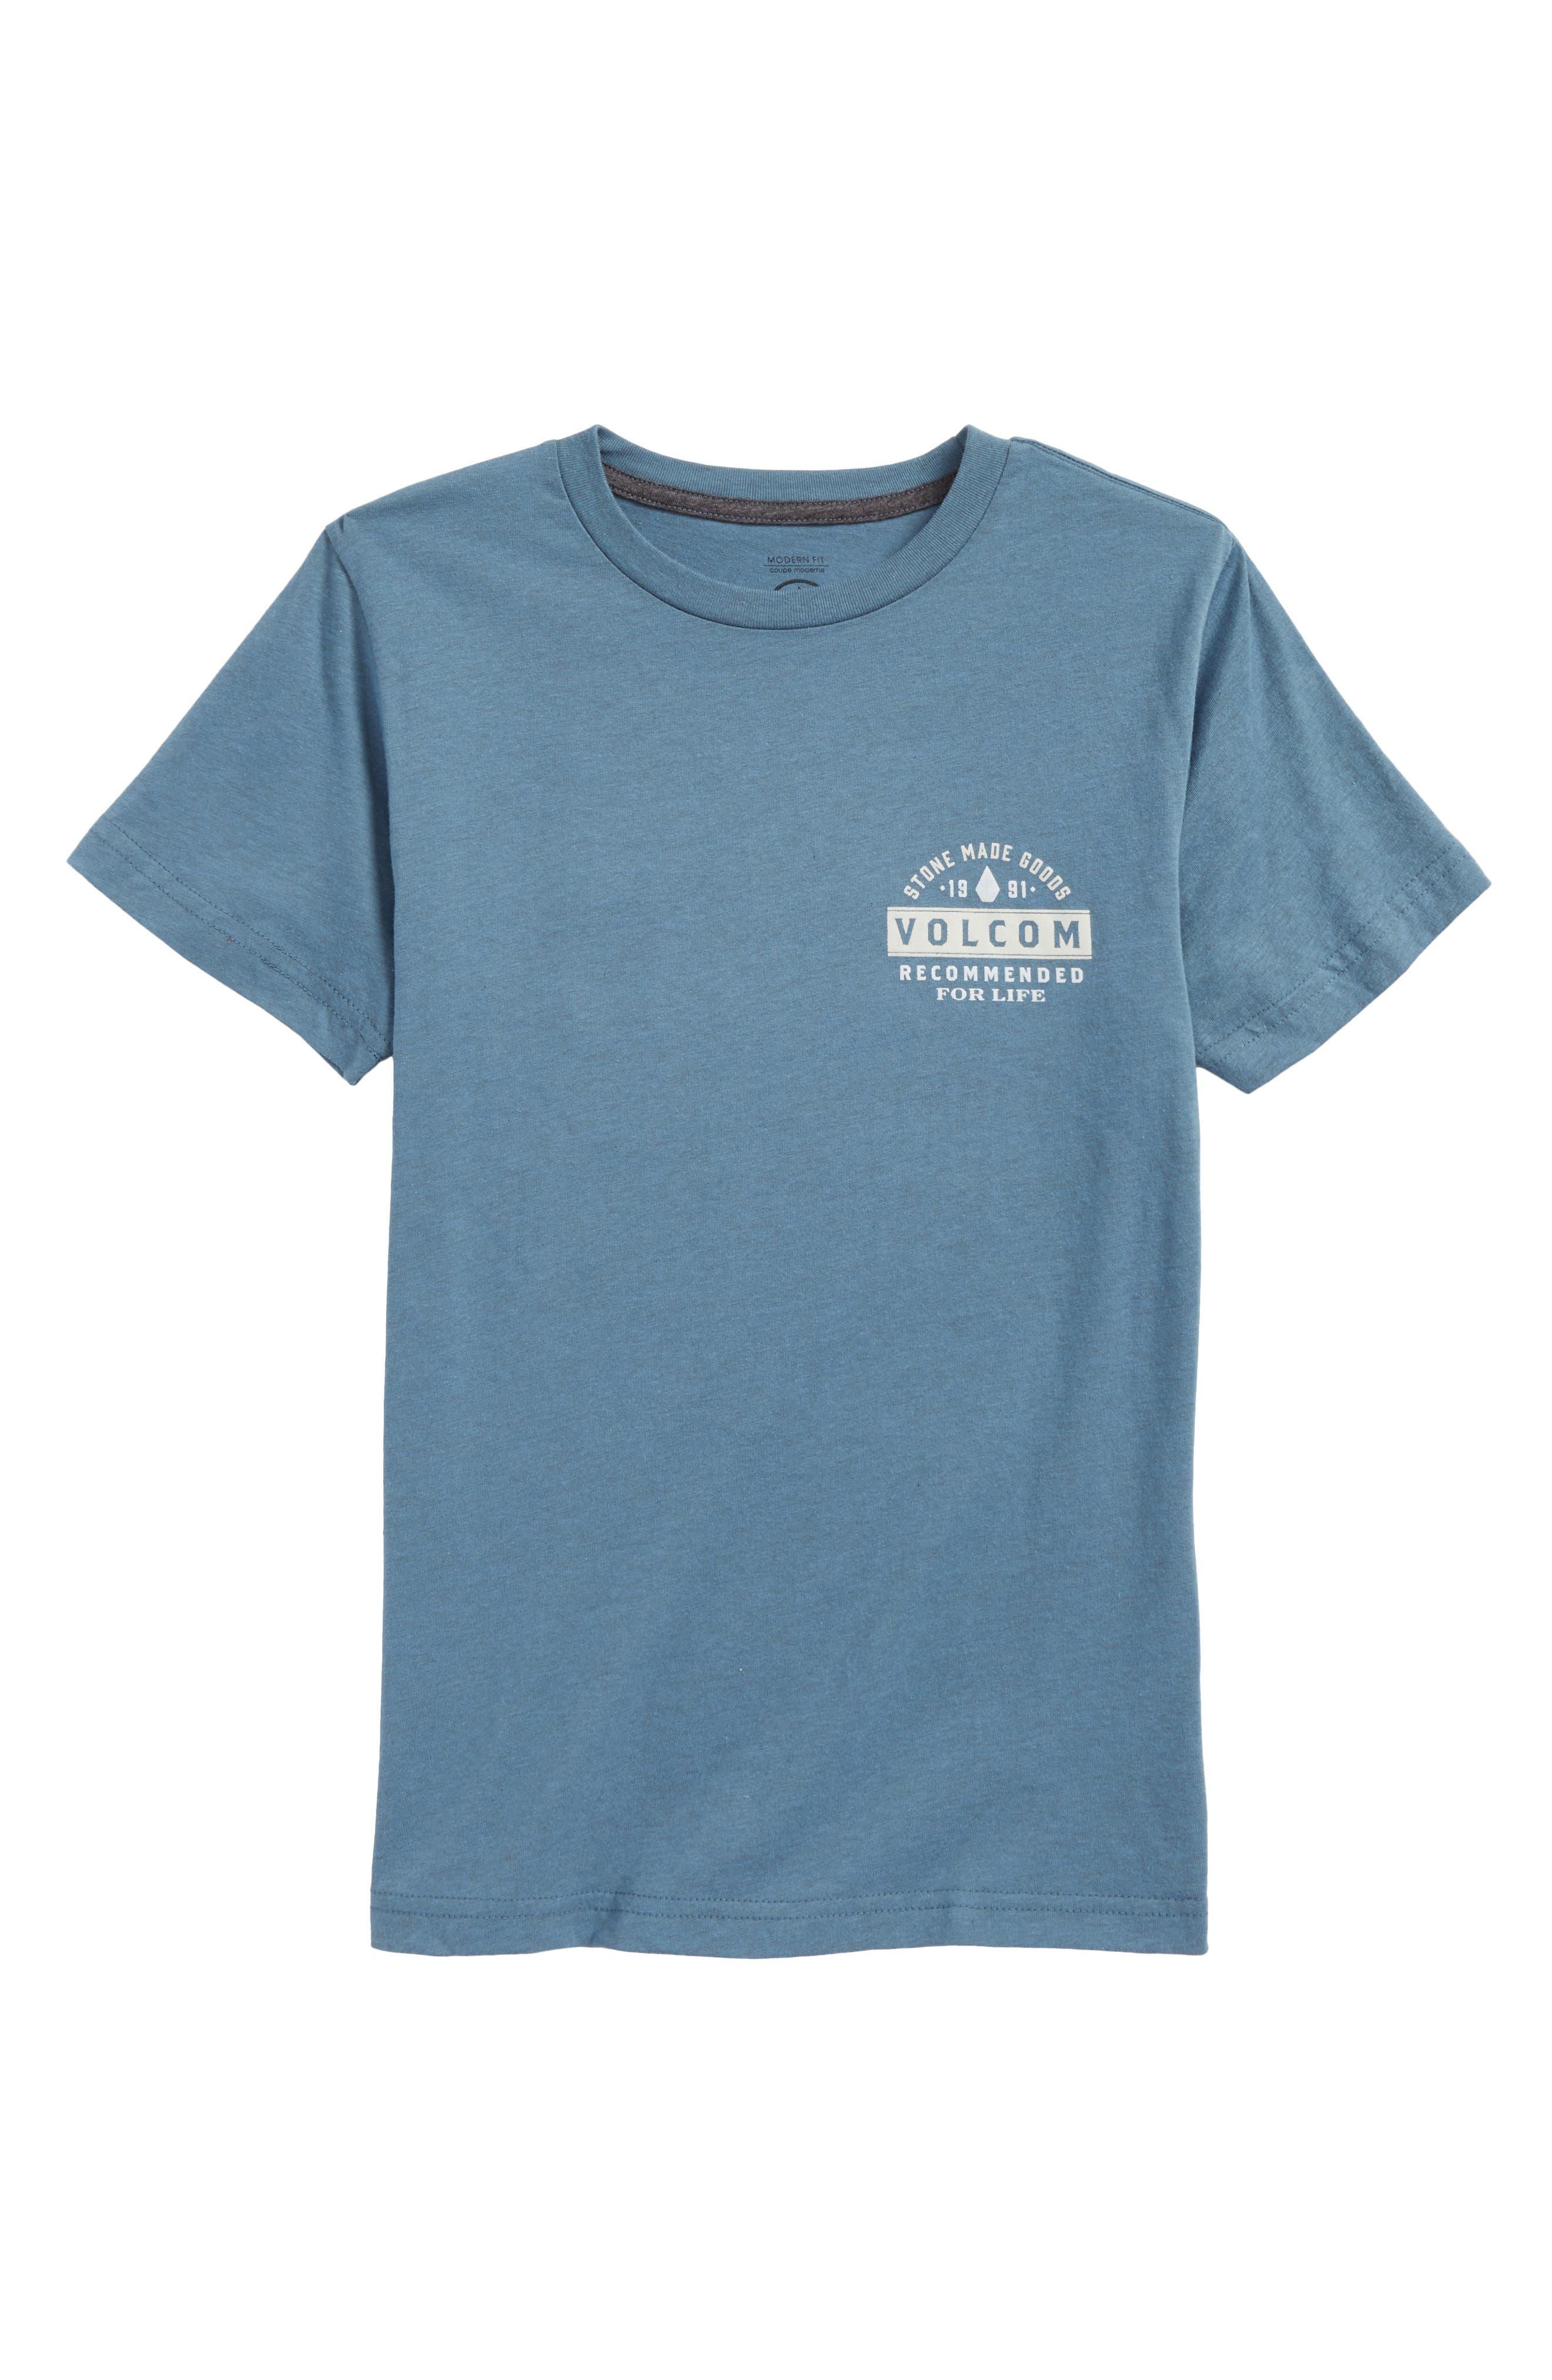 Main Image - Volcom Barred Logo Graphic T-Shirt (Big Boys)